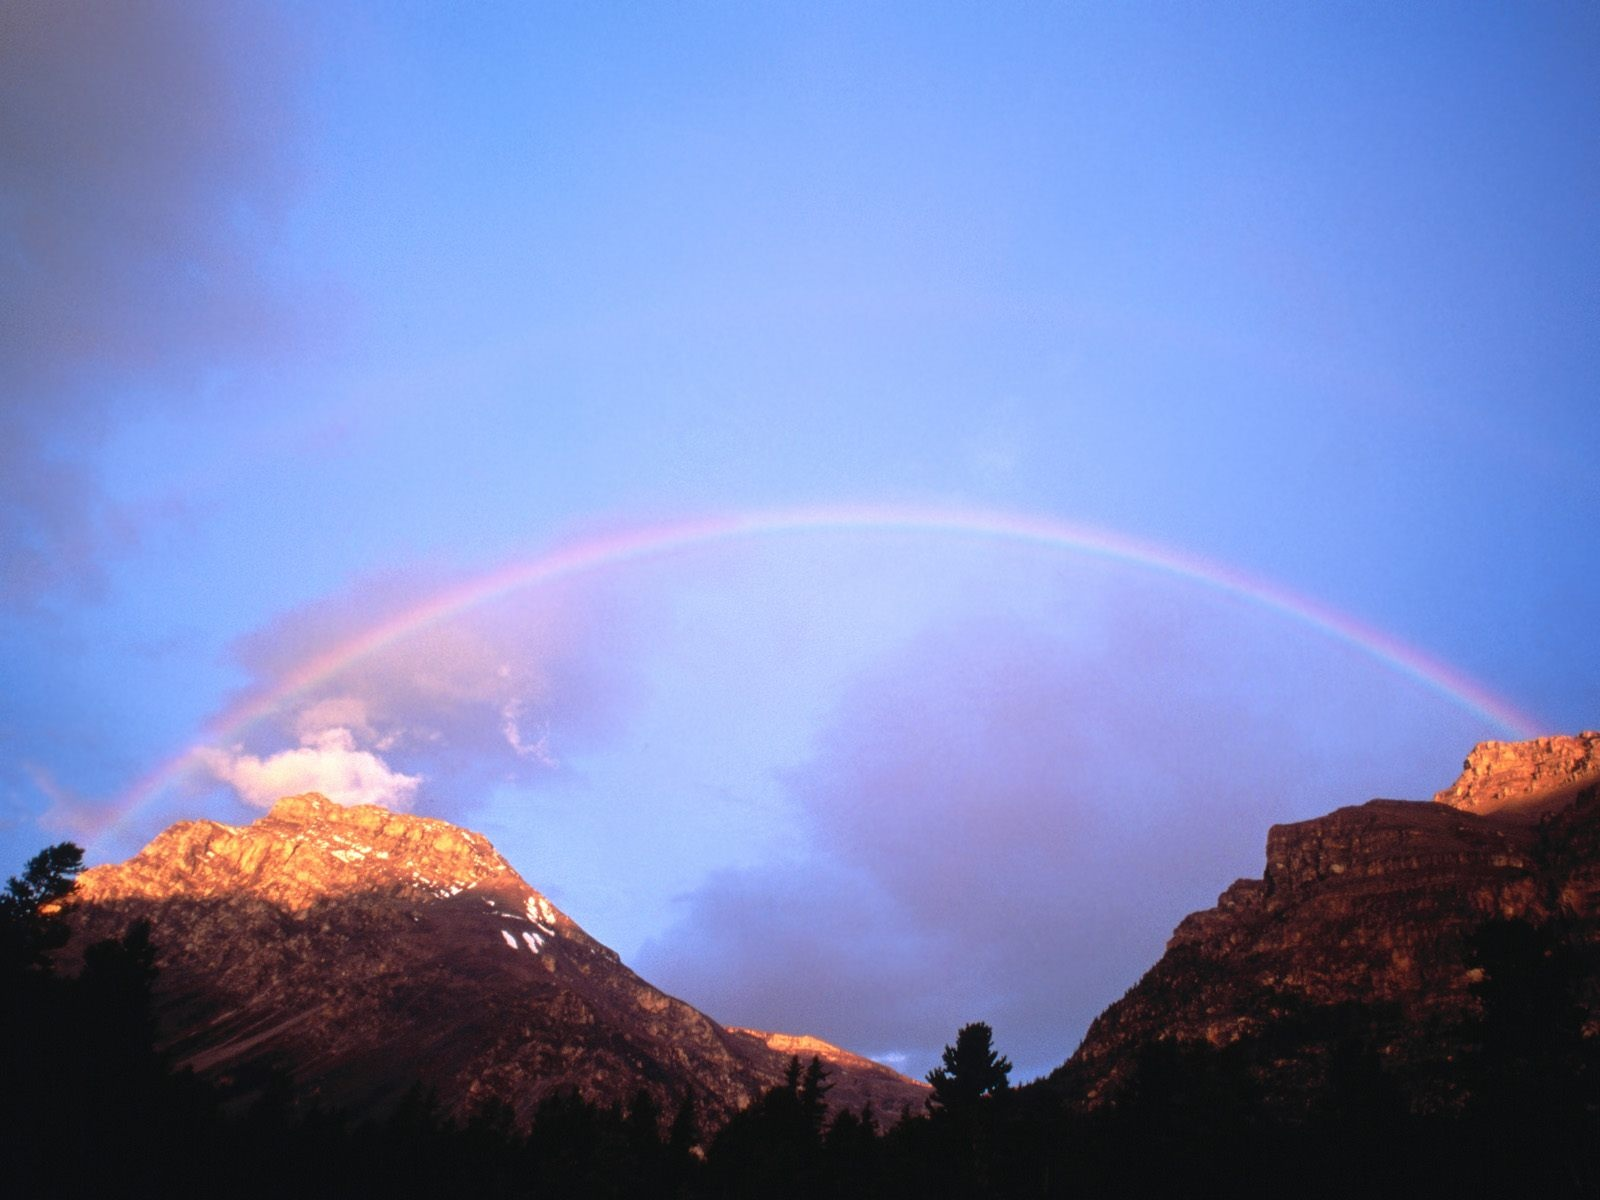 Rainbow - Hd Wallpapers 1600x1200 | Hd Wallpaper